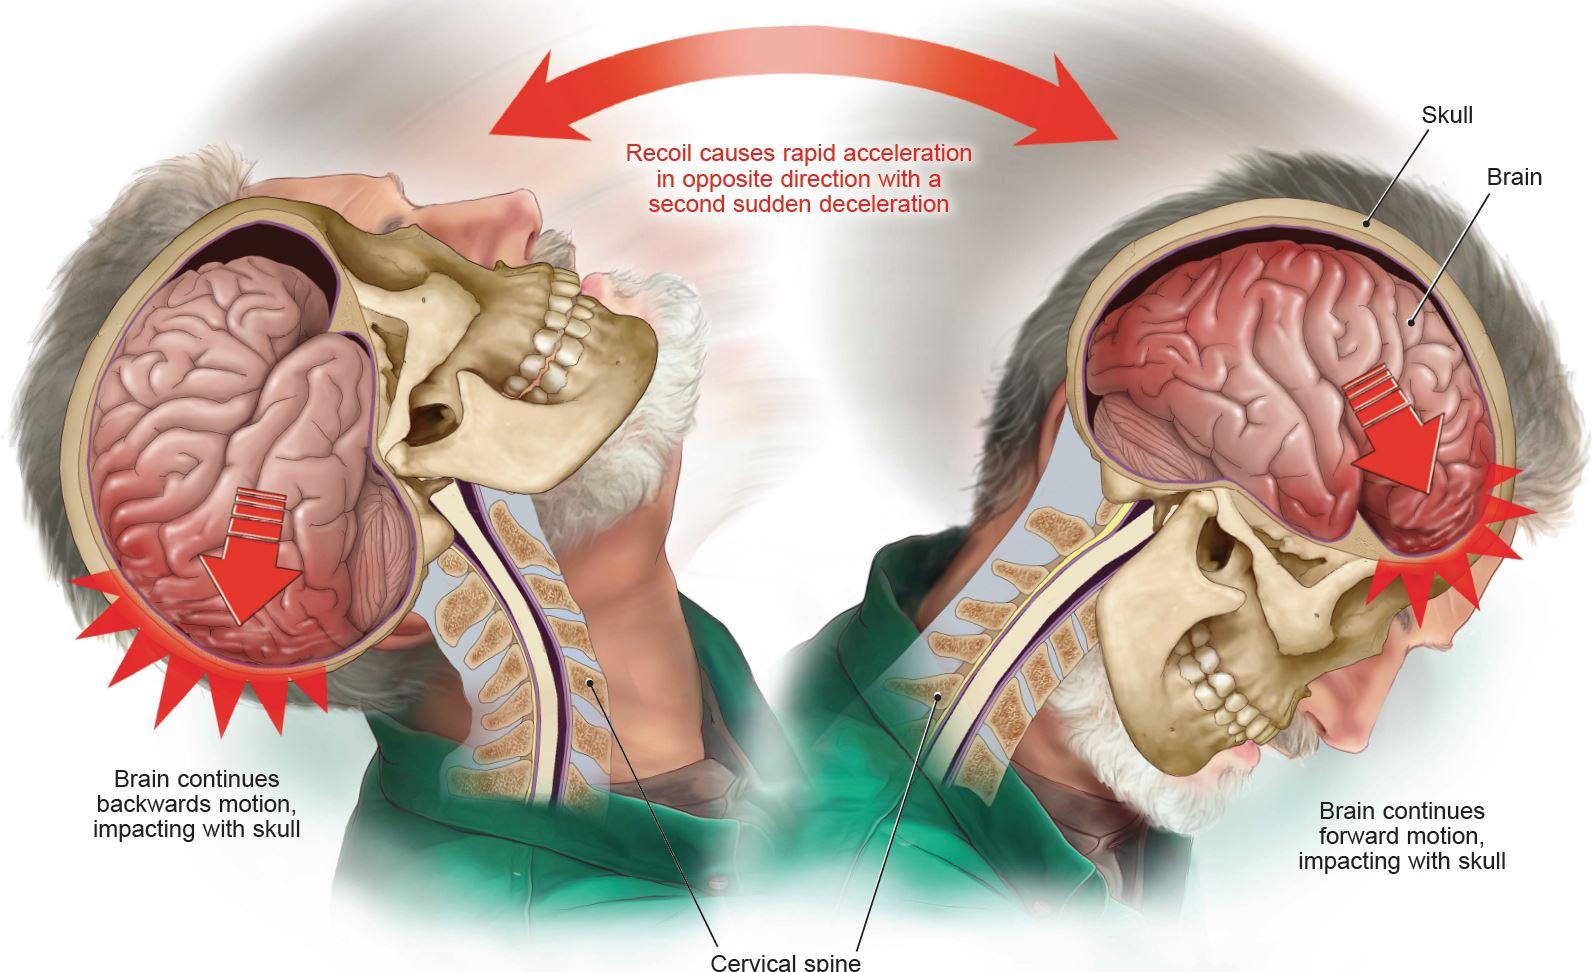 Coup-Contrecoup Client Brain Injury Settlement Virginia